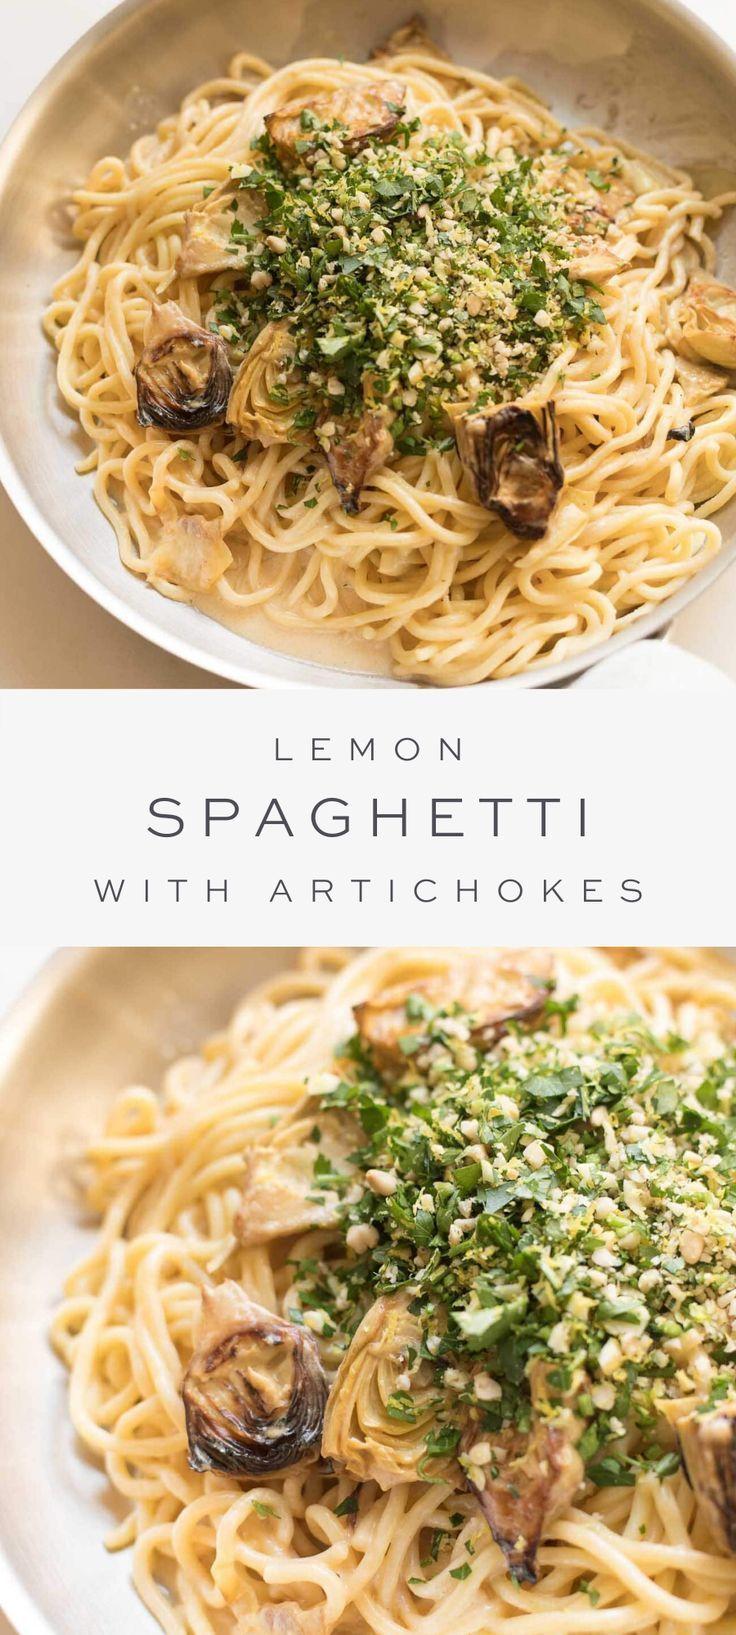 Lemon Spaghetti with Artichokes {and the Best Lemon Cream Sauce}